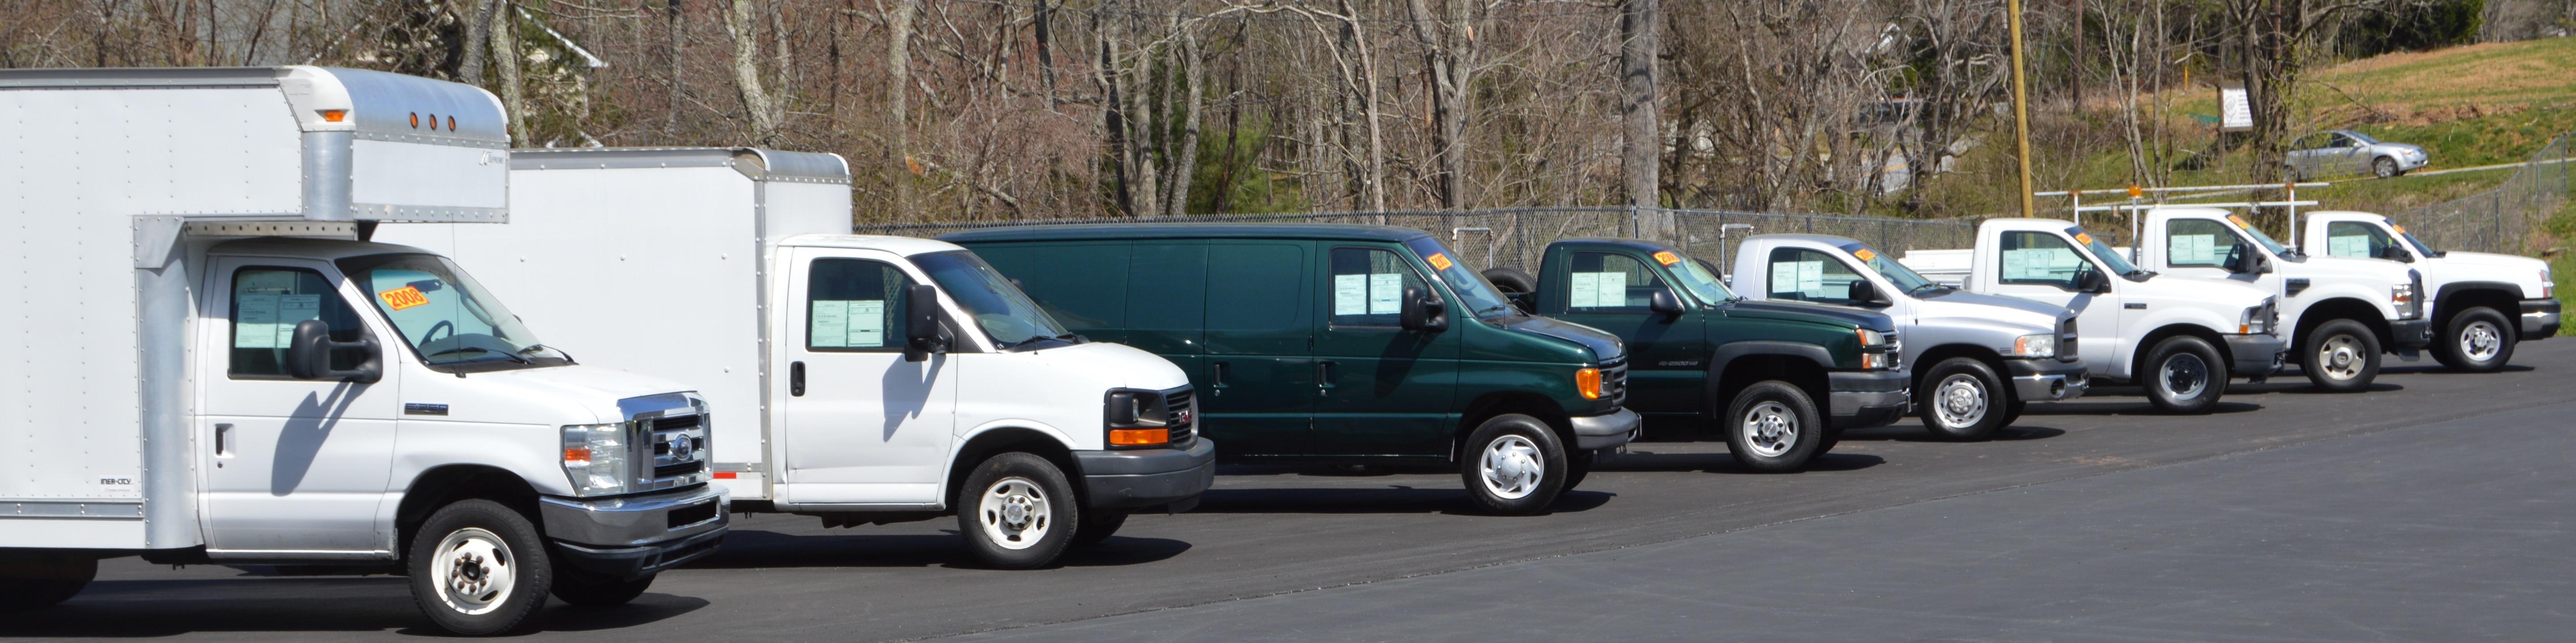 Premier Commercial Trucks image 3